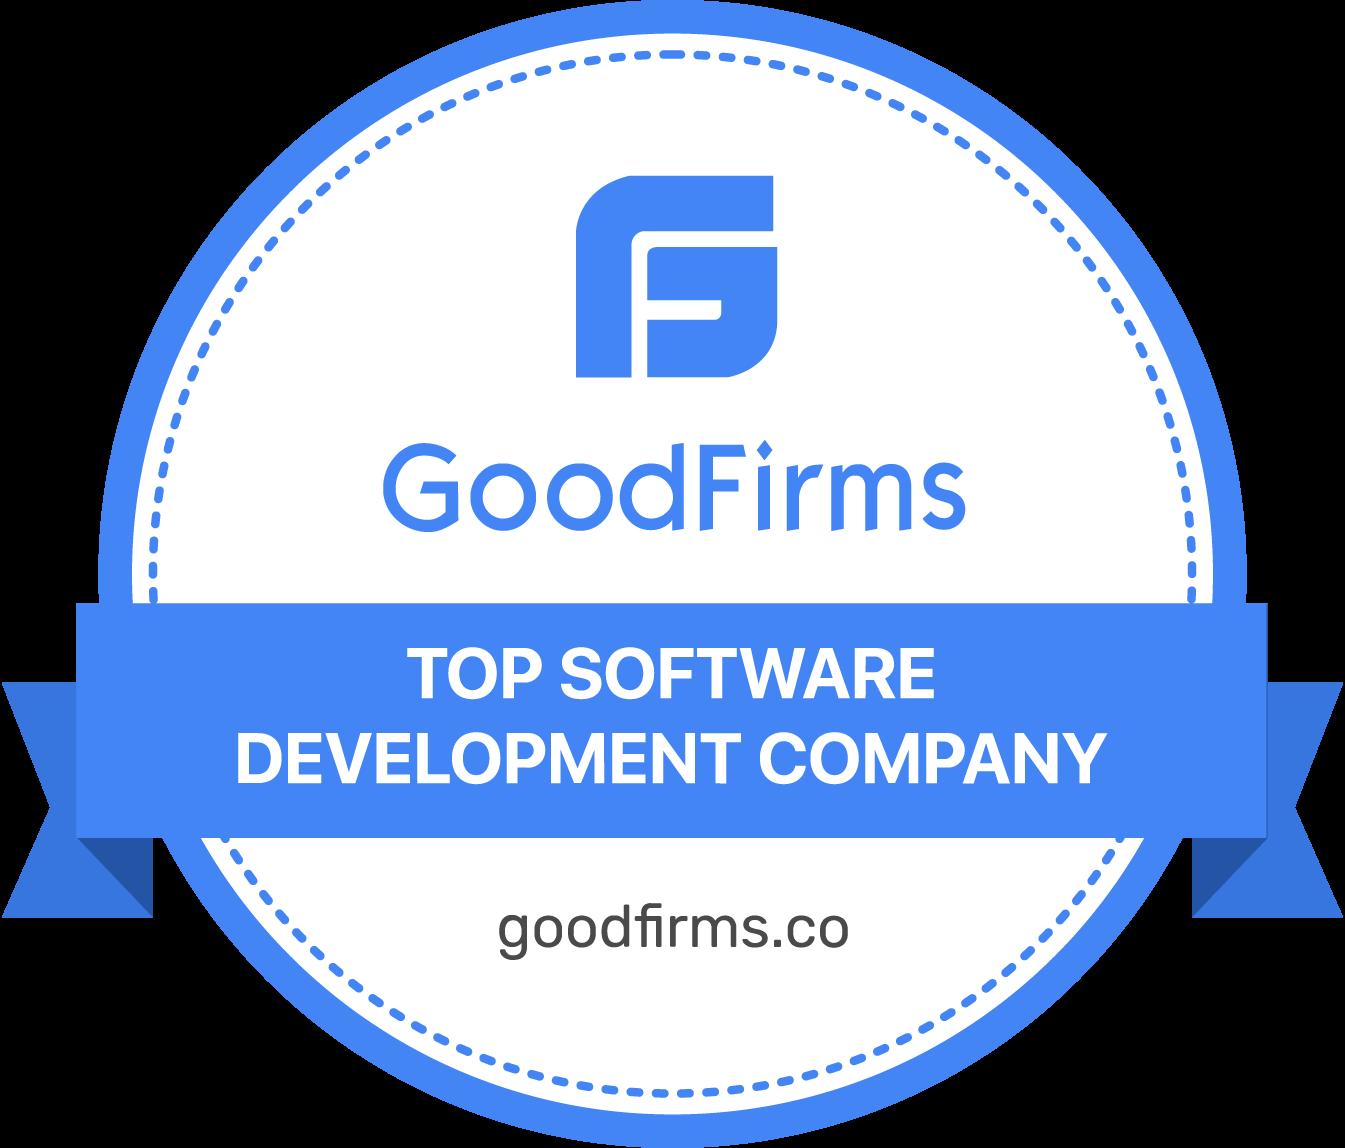 The MASCC - Goodfirms Award